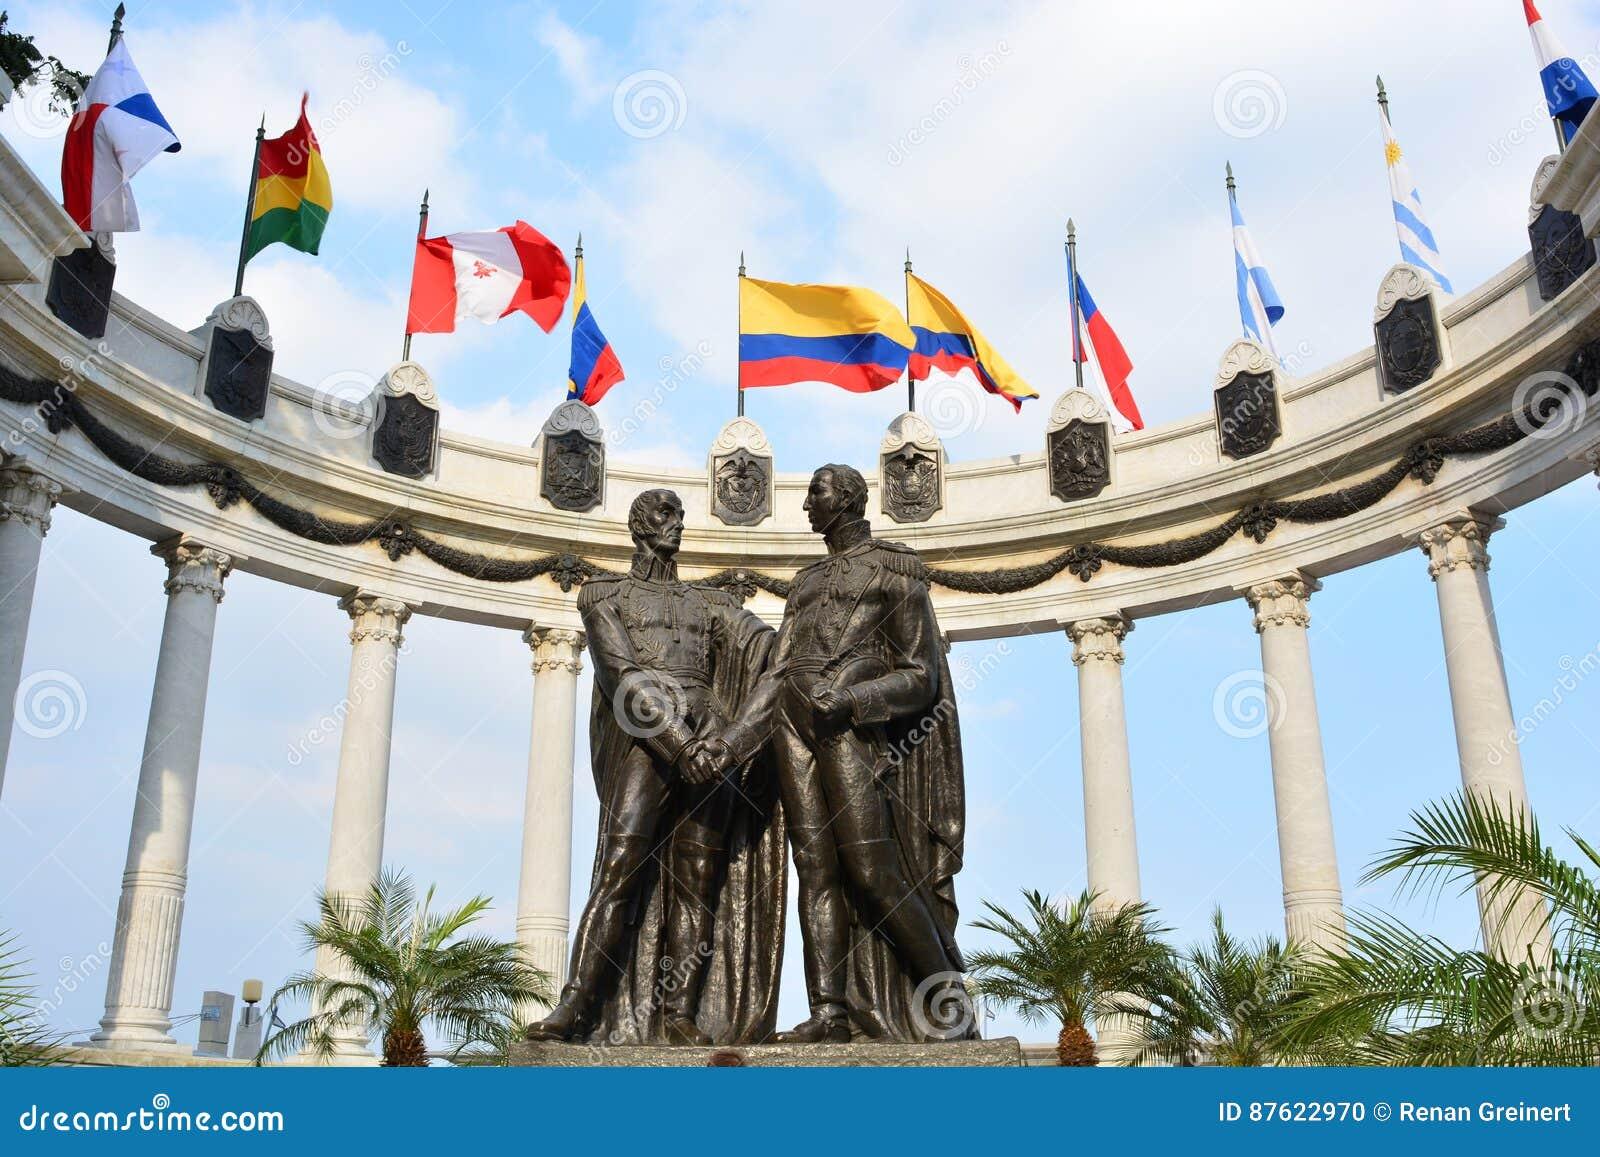 Statue of Simón Bolivar and San Martin de los Andes in Guayaquil, Ecuador